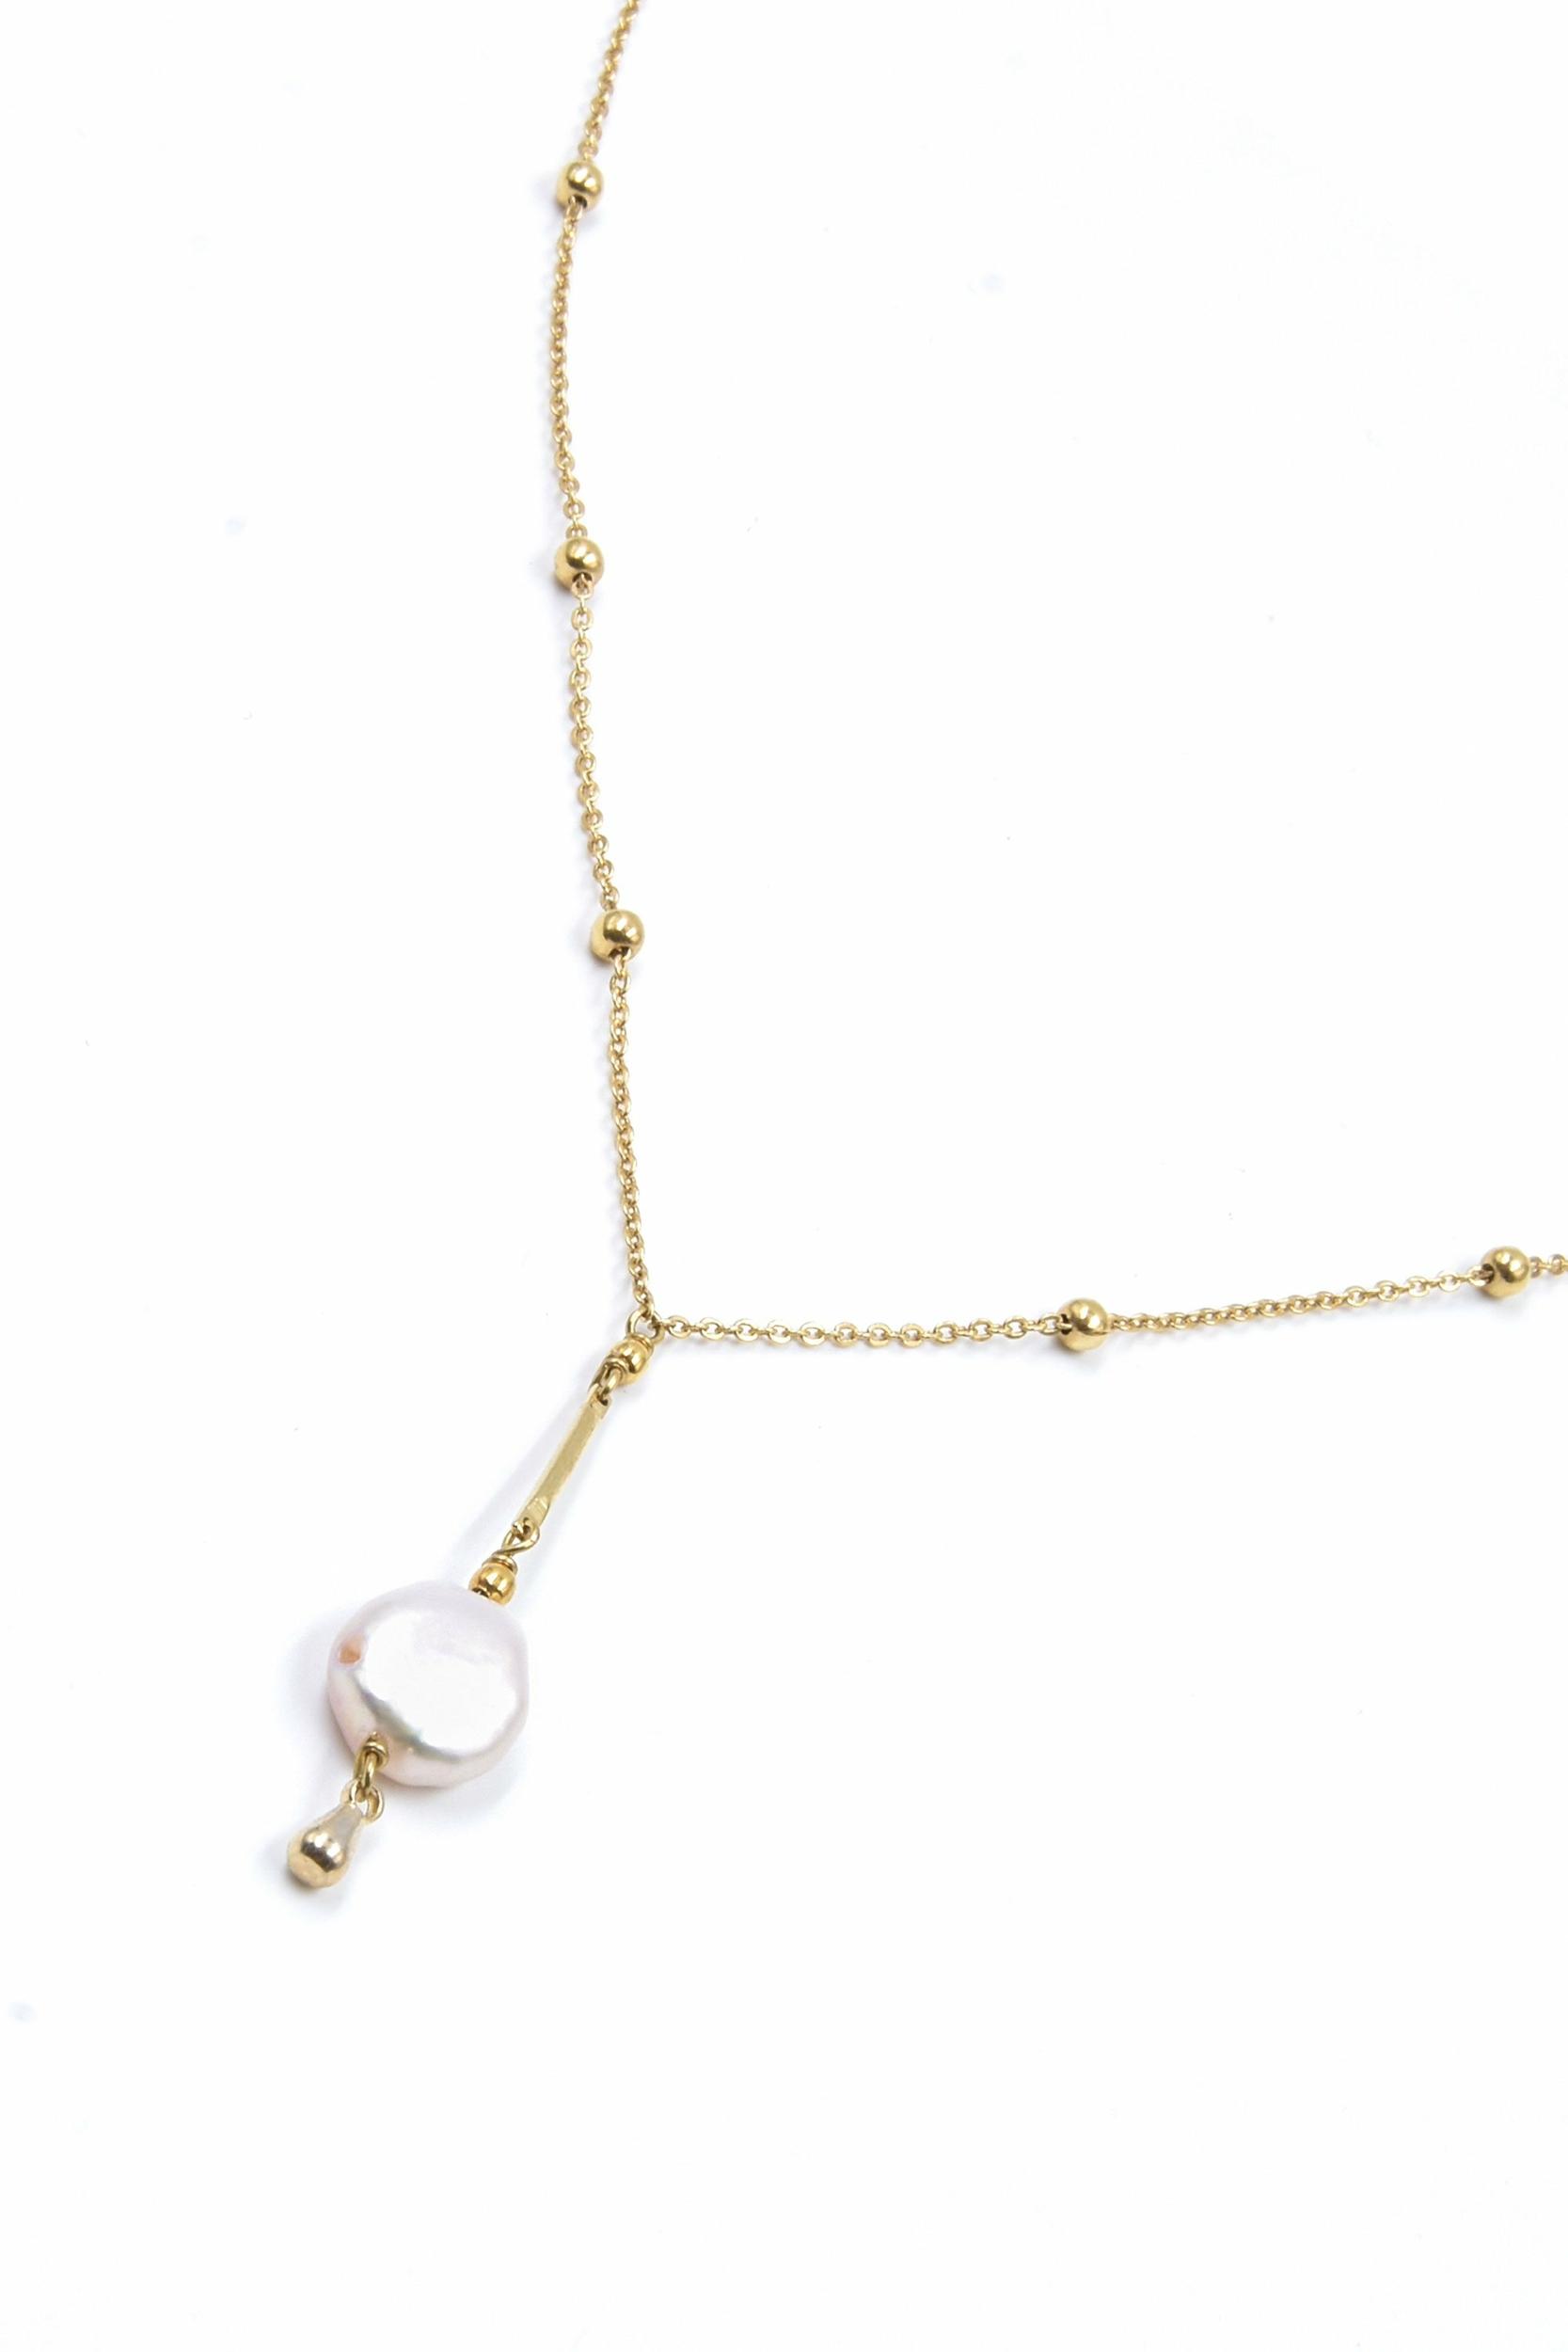 Collier-perla-blanca CJ0304a